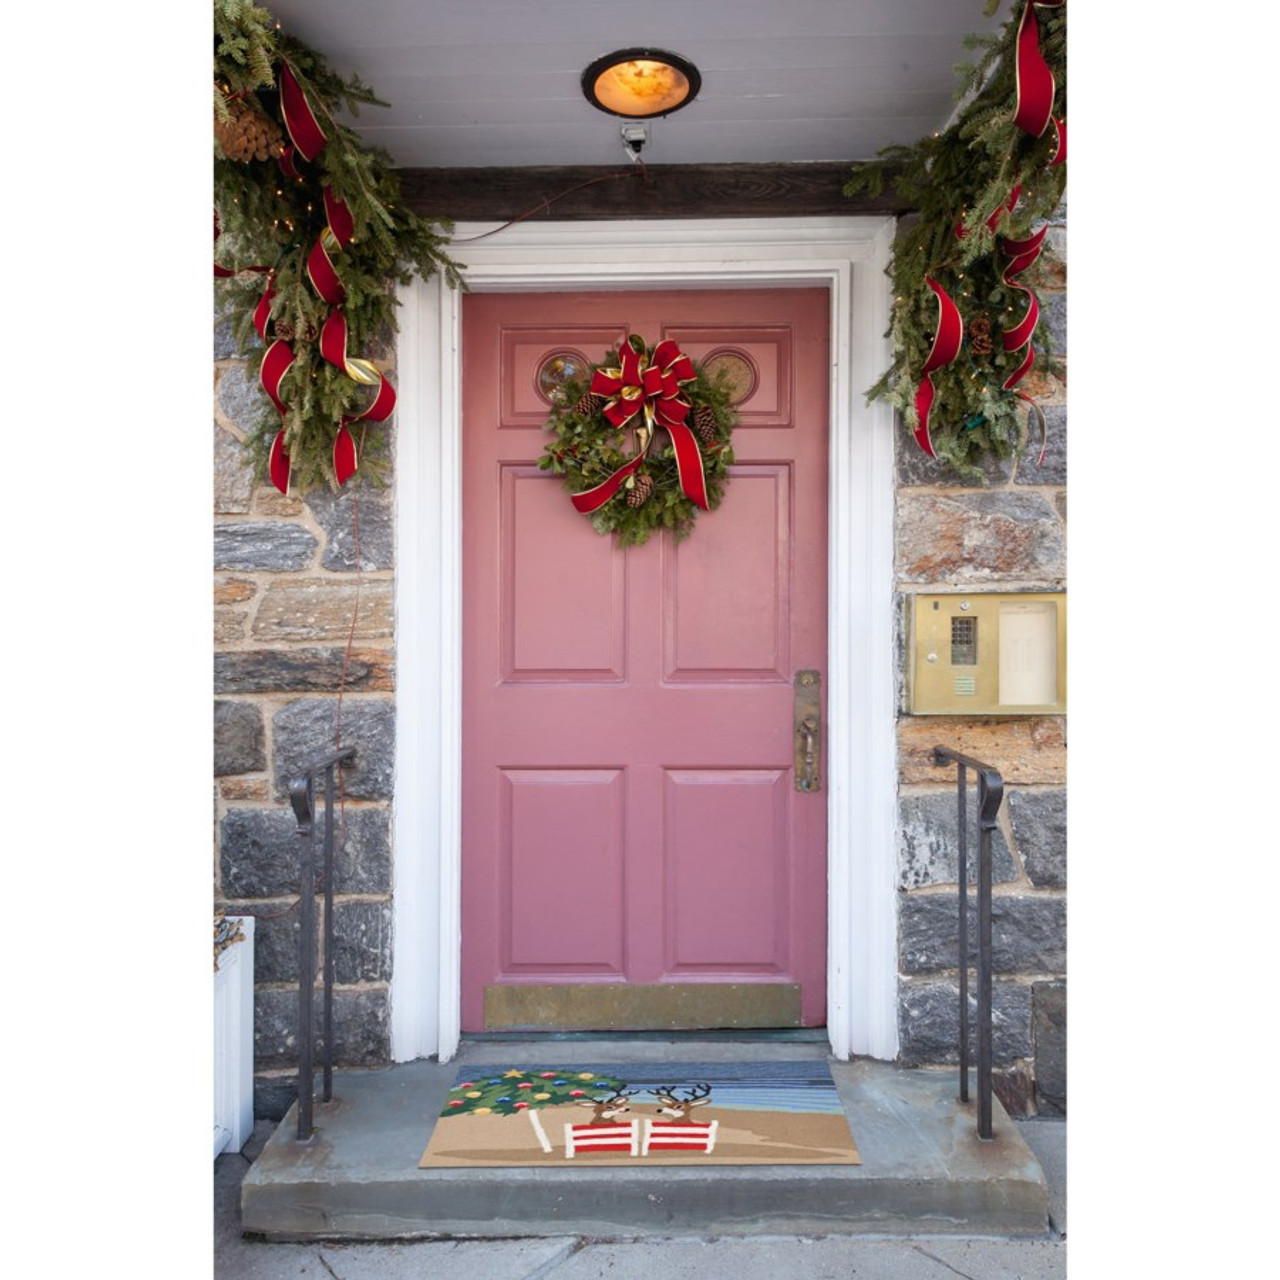 Frontporch Coastal Christmas Indoor/Outdoor Rug - Lifestyle